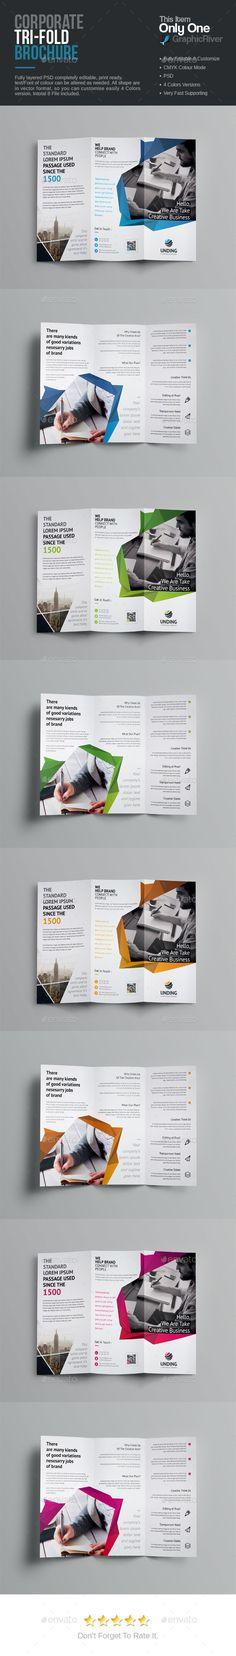 474 best tri fold brochure images on pinterest in 2018 brochure